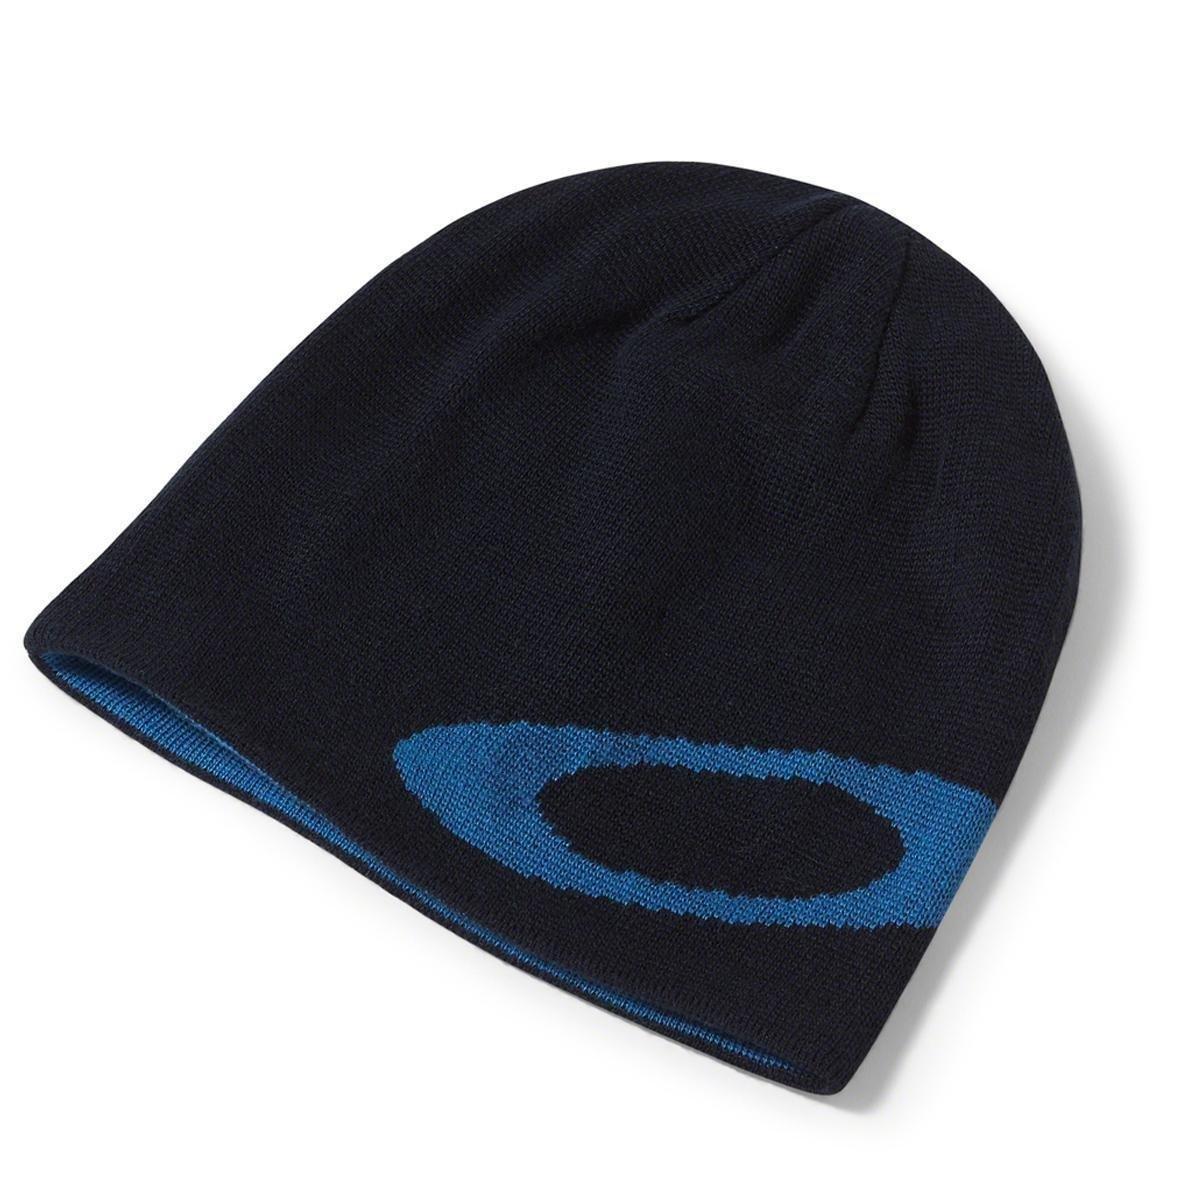 5f4b173361b22 Gorro Oakley Mainline Masculino - Azul - Compre Agora